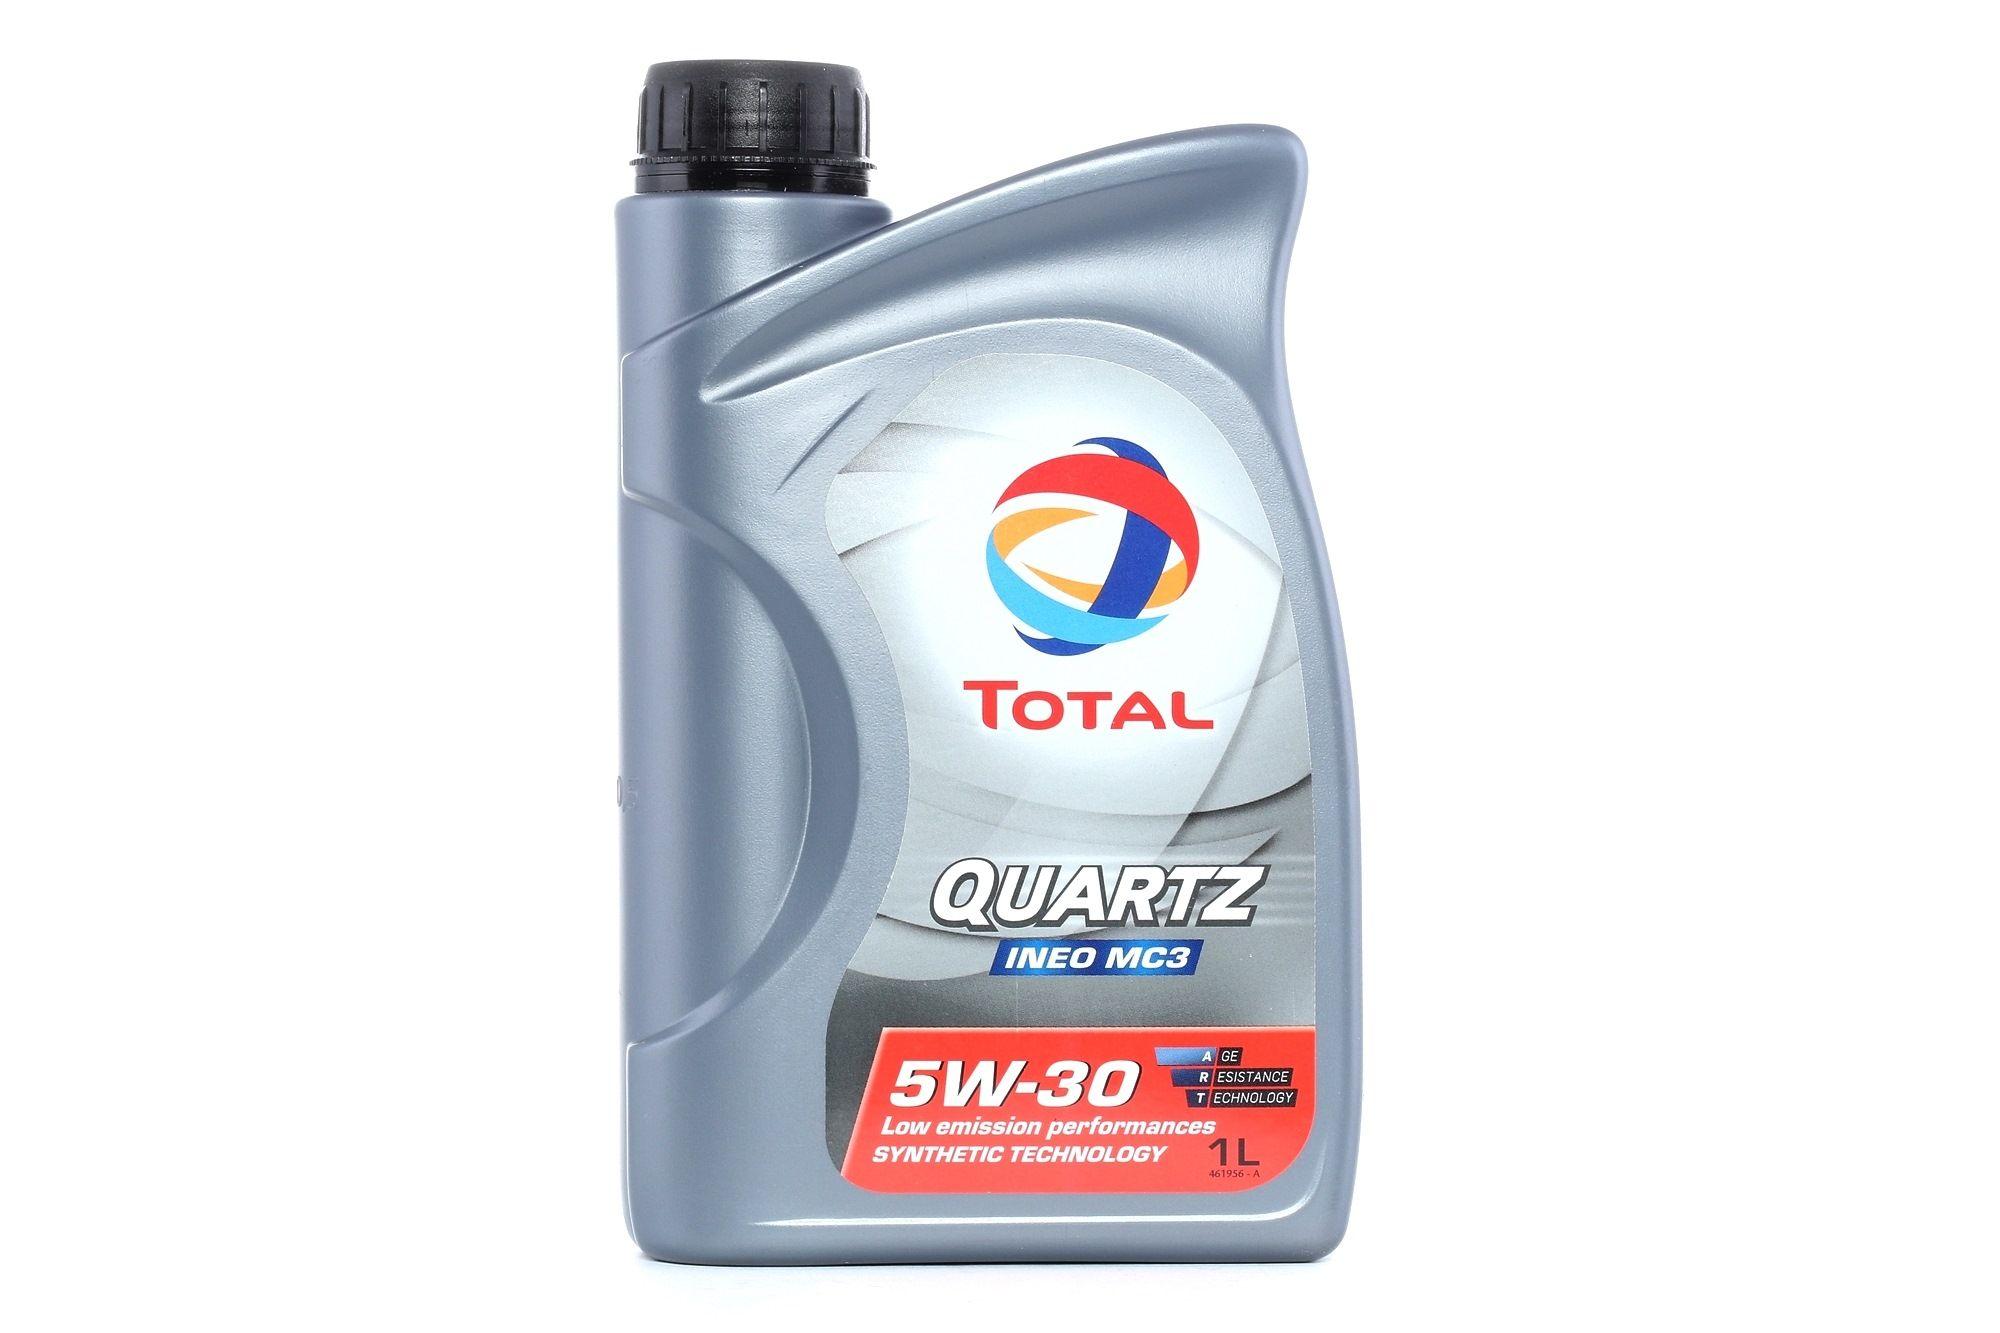 0501CA224CJ1468548 TOTAL Quartz, INEO MC3 5W-30, 1l, Óleo sintético Óleo do motor 2166254 comprar económica